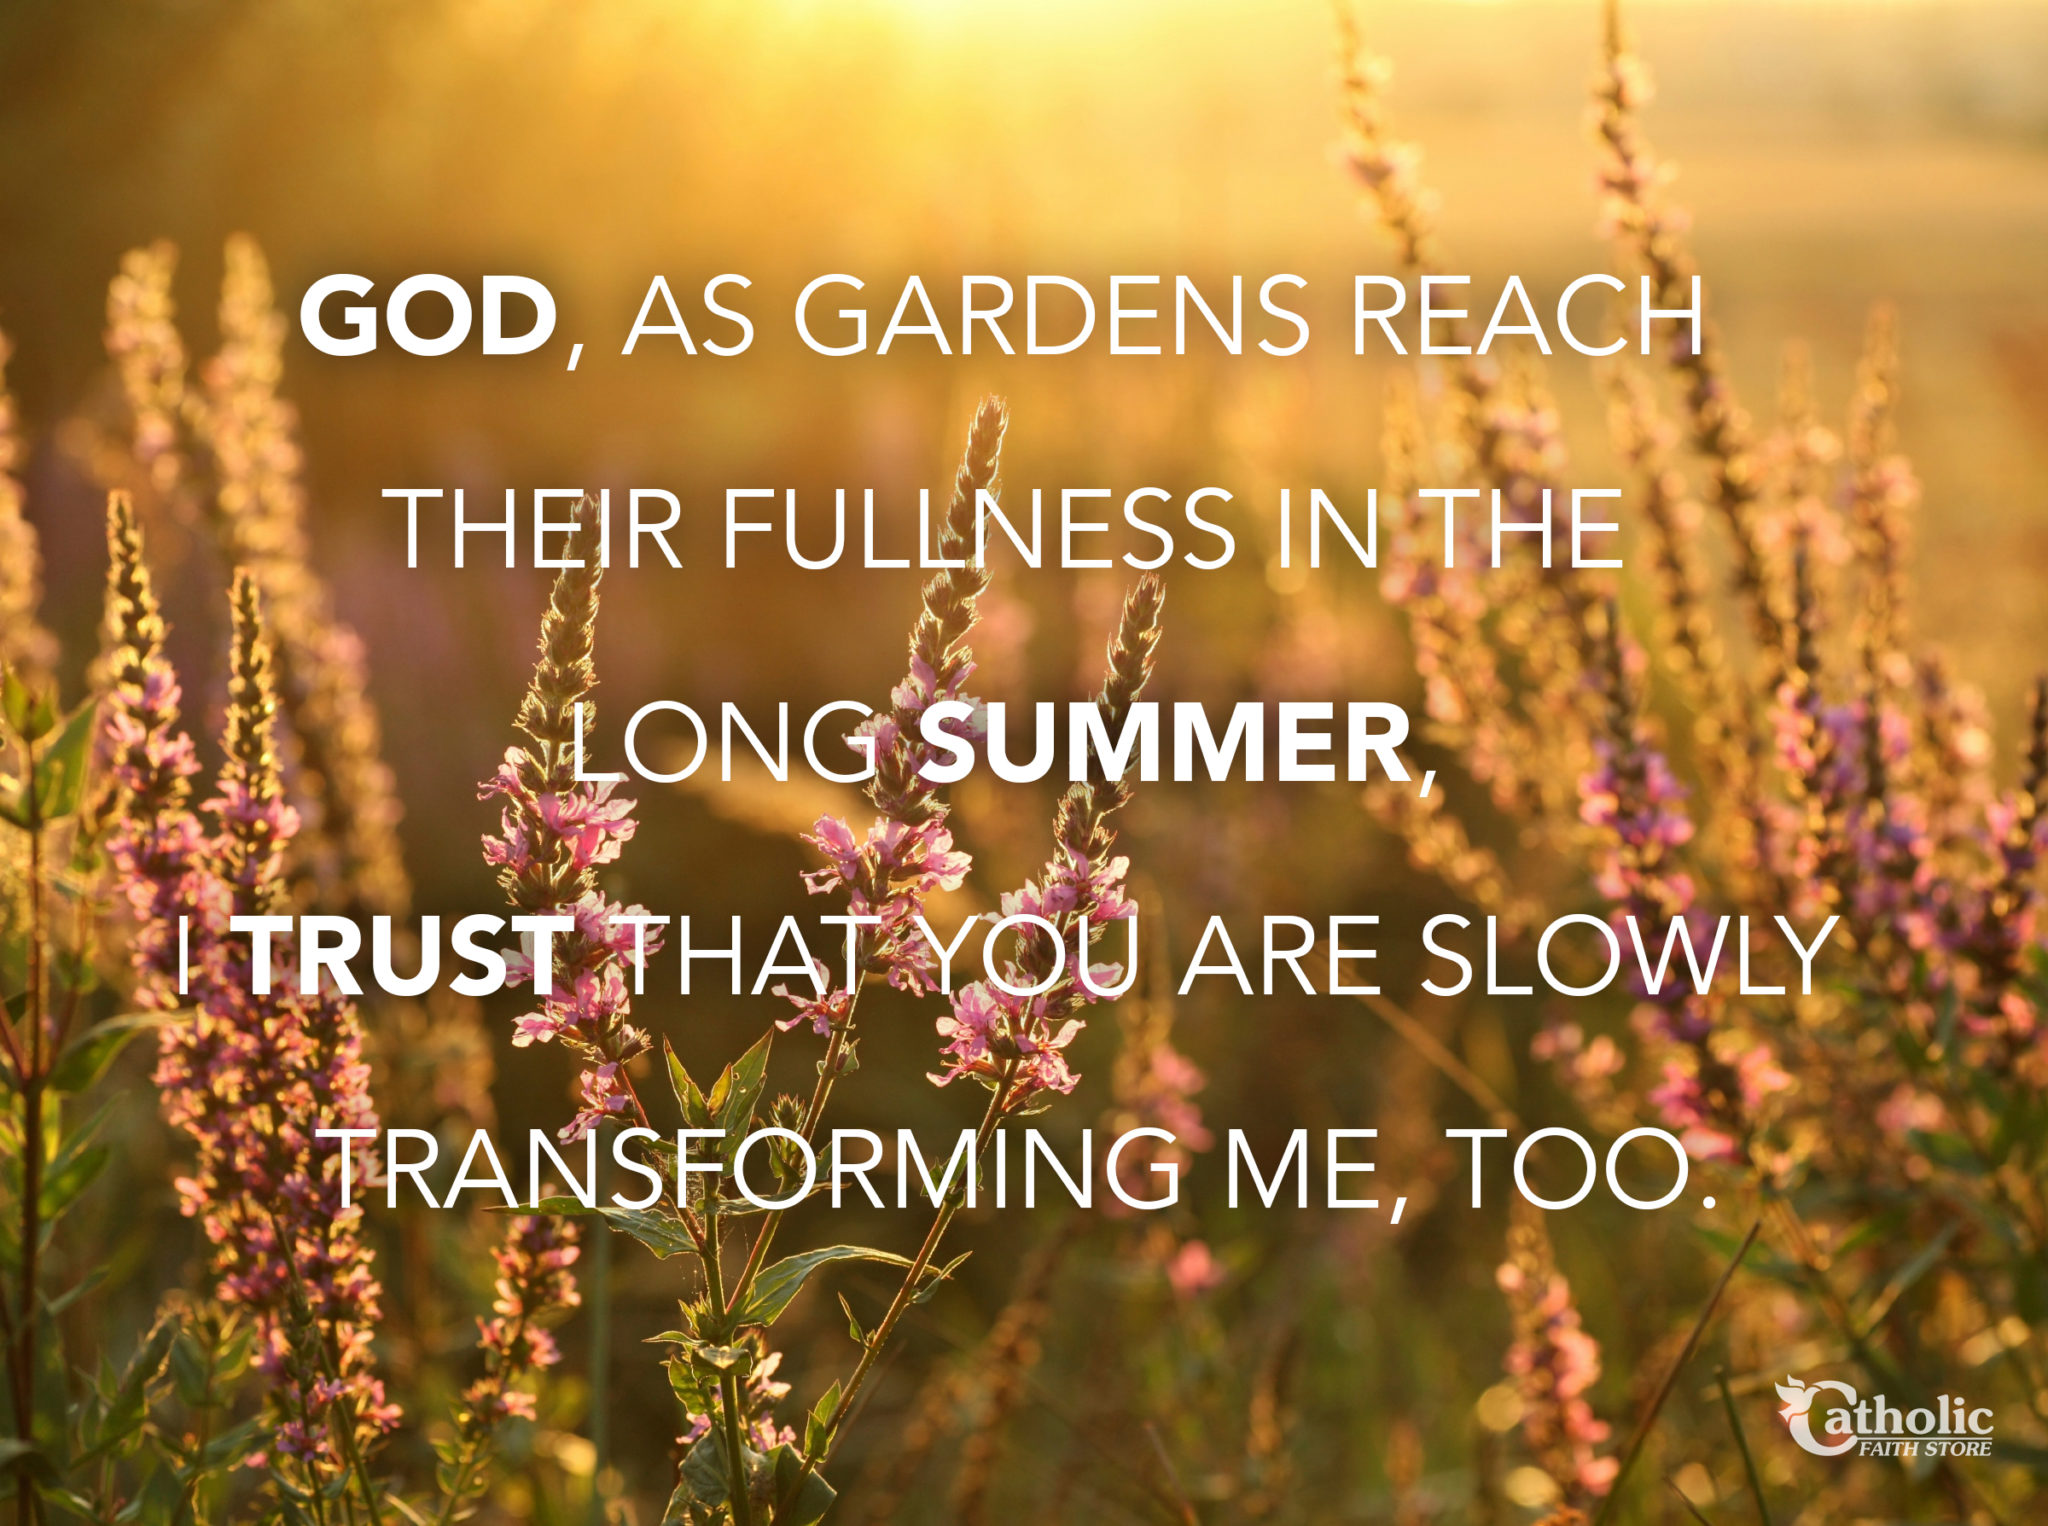 Summer Gardens Trust in God